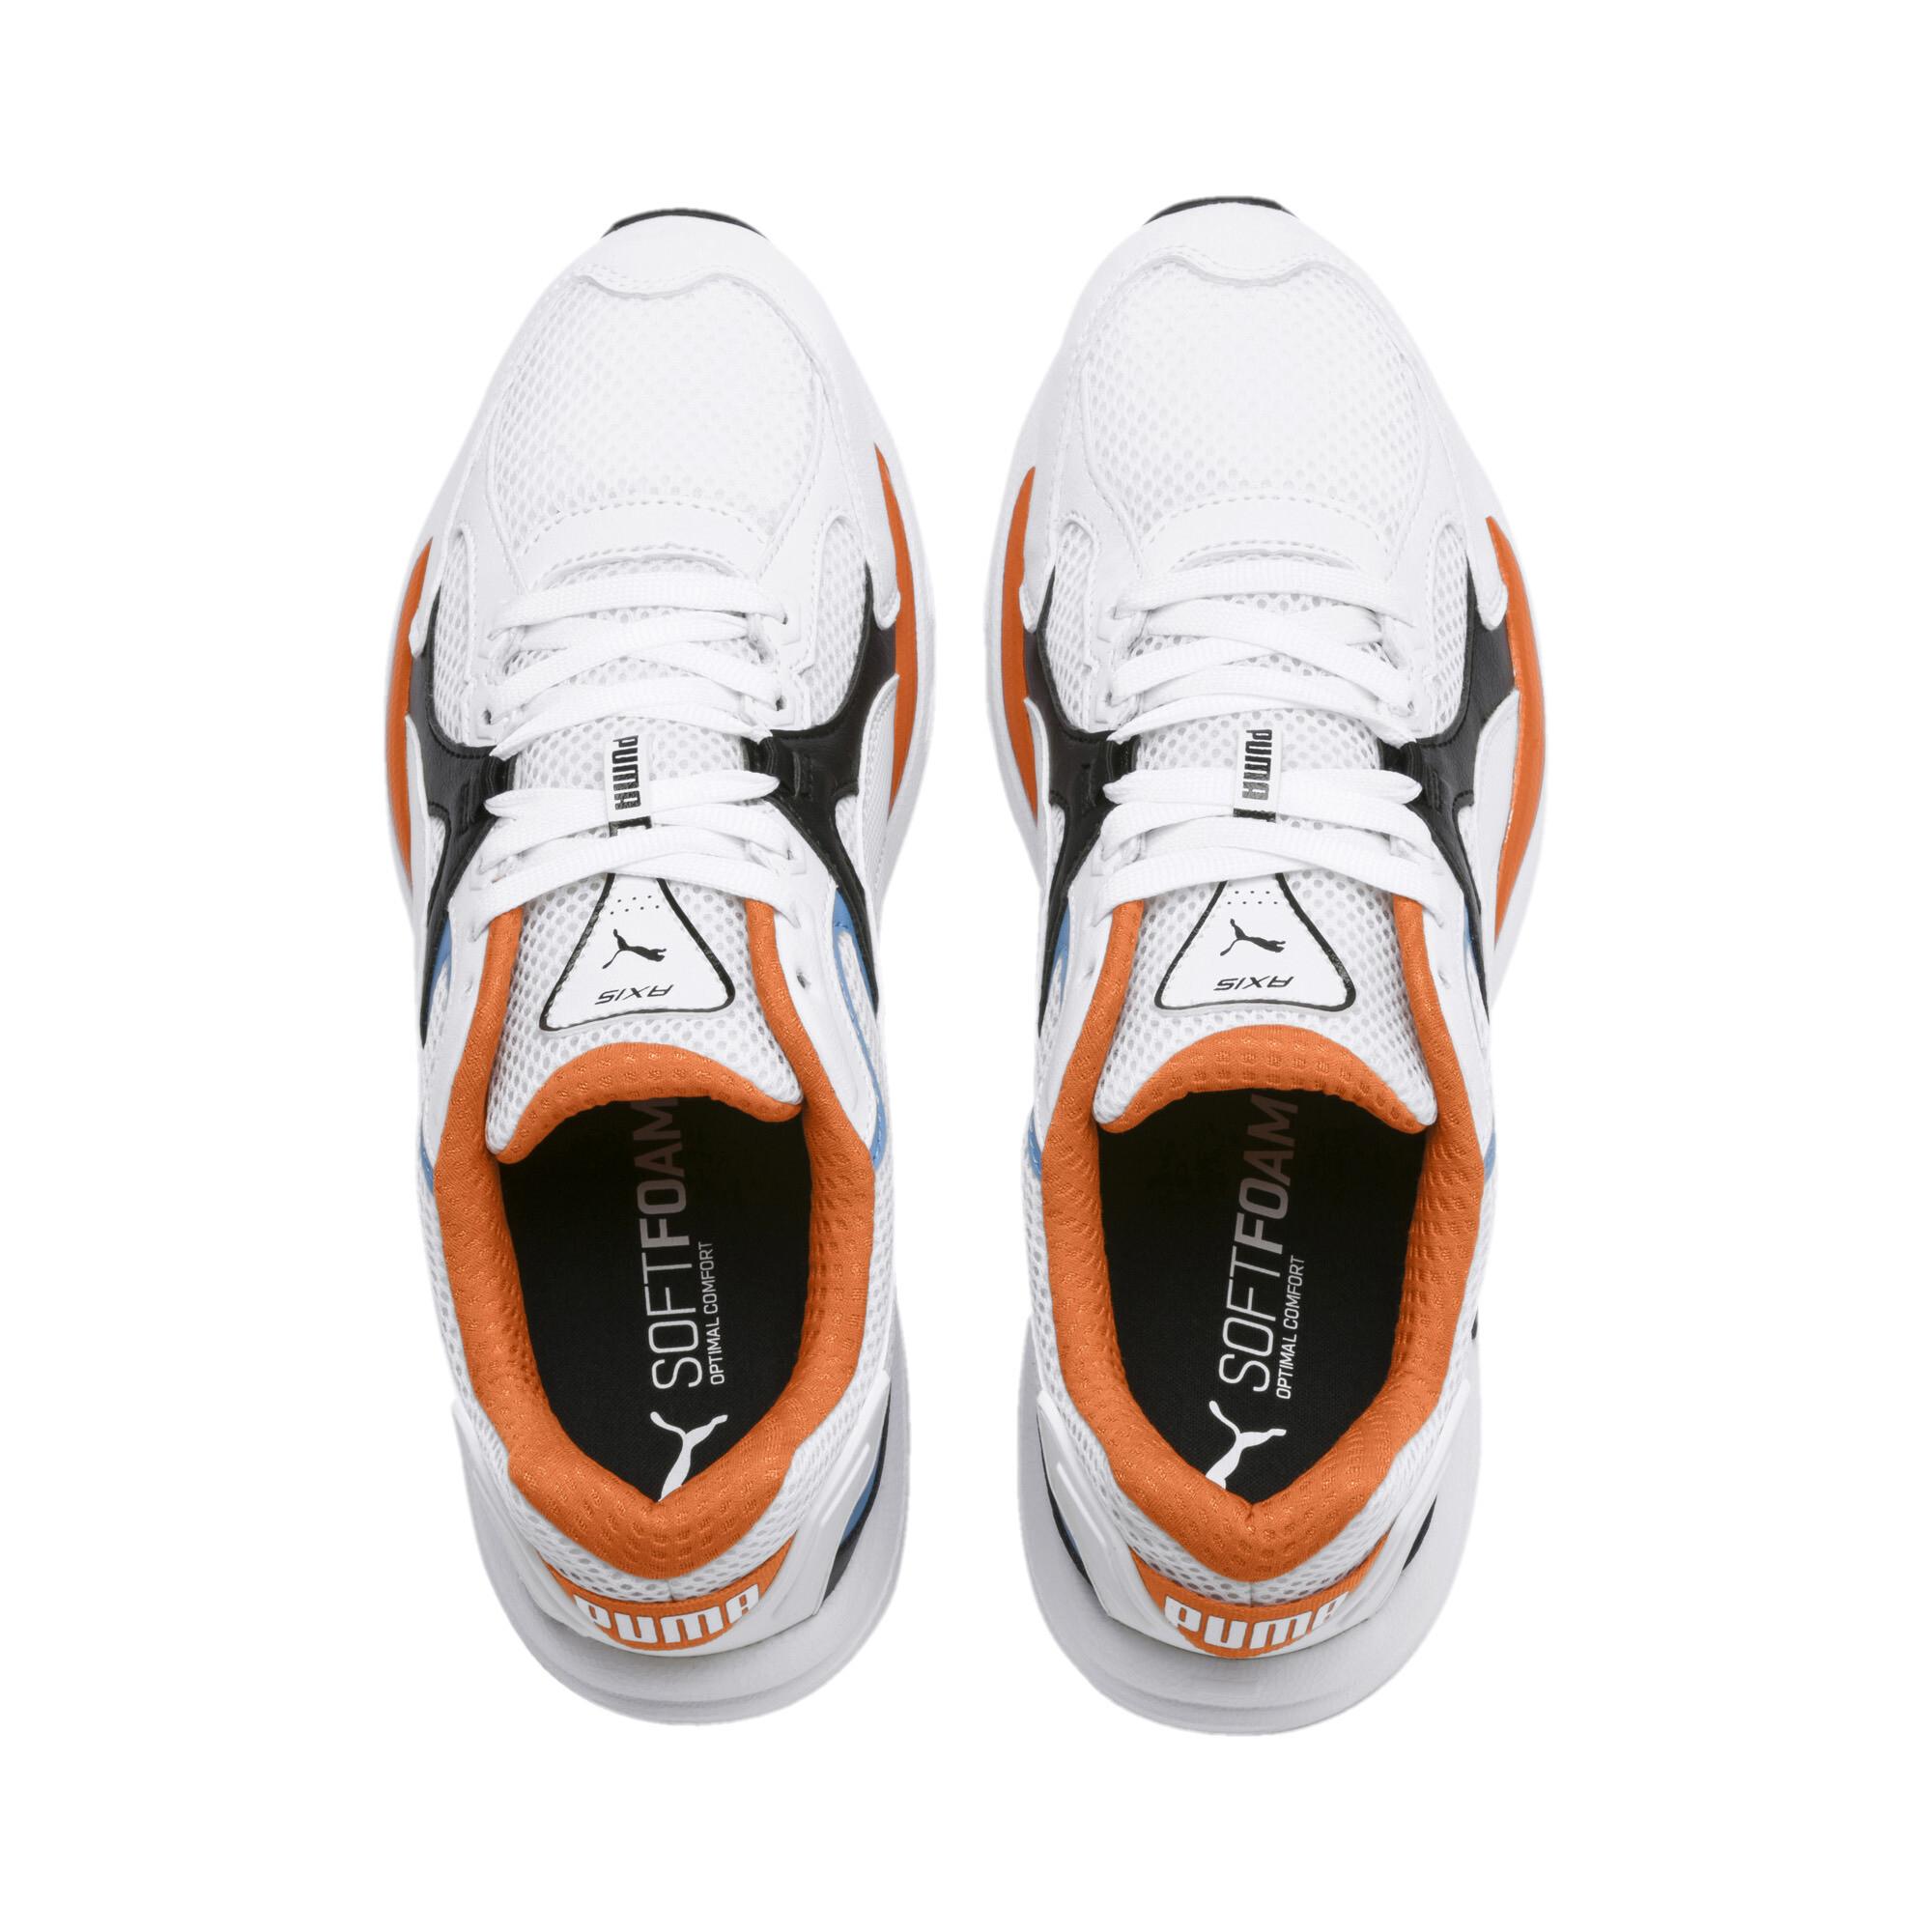 PUMA-Axis-Plus-90s-Sneakers-Men-Shoe-Basics thumbnail 21